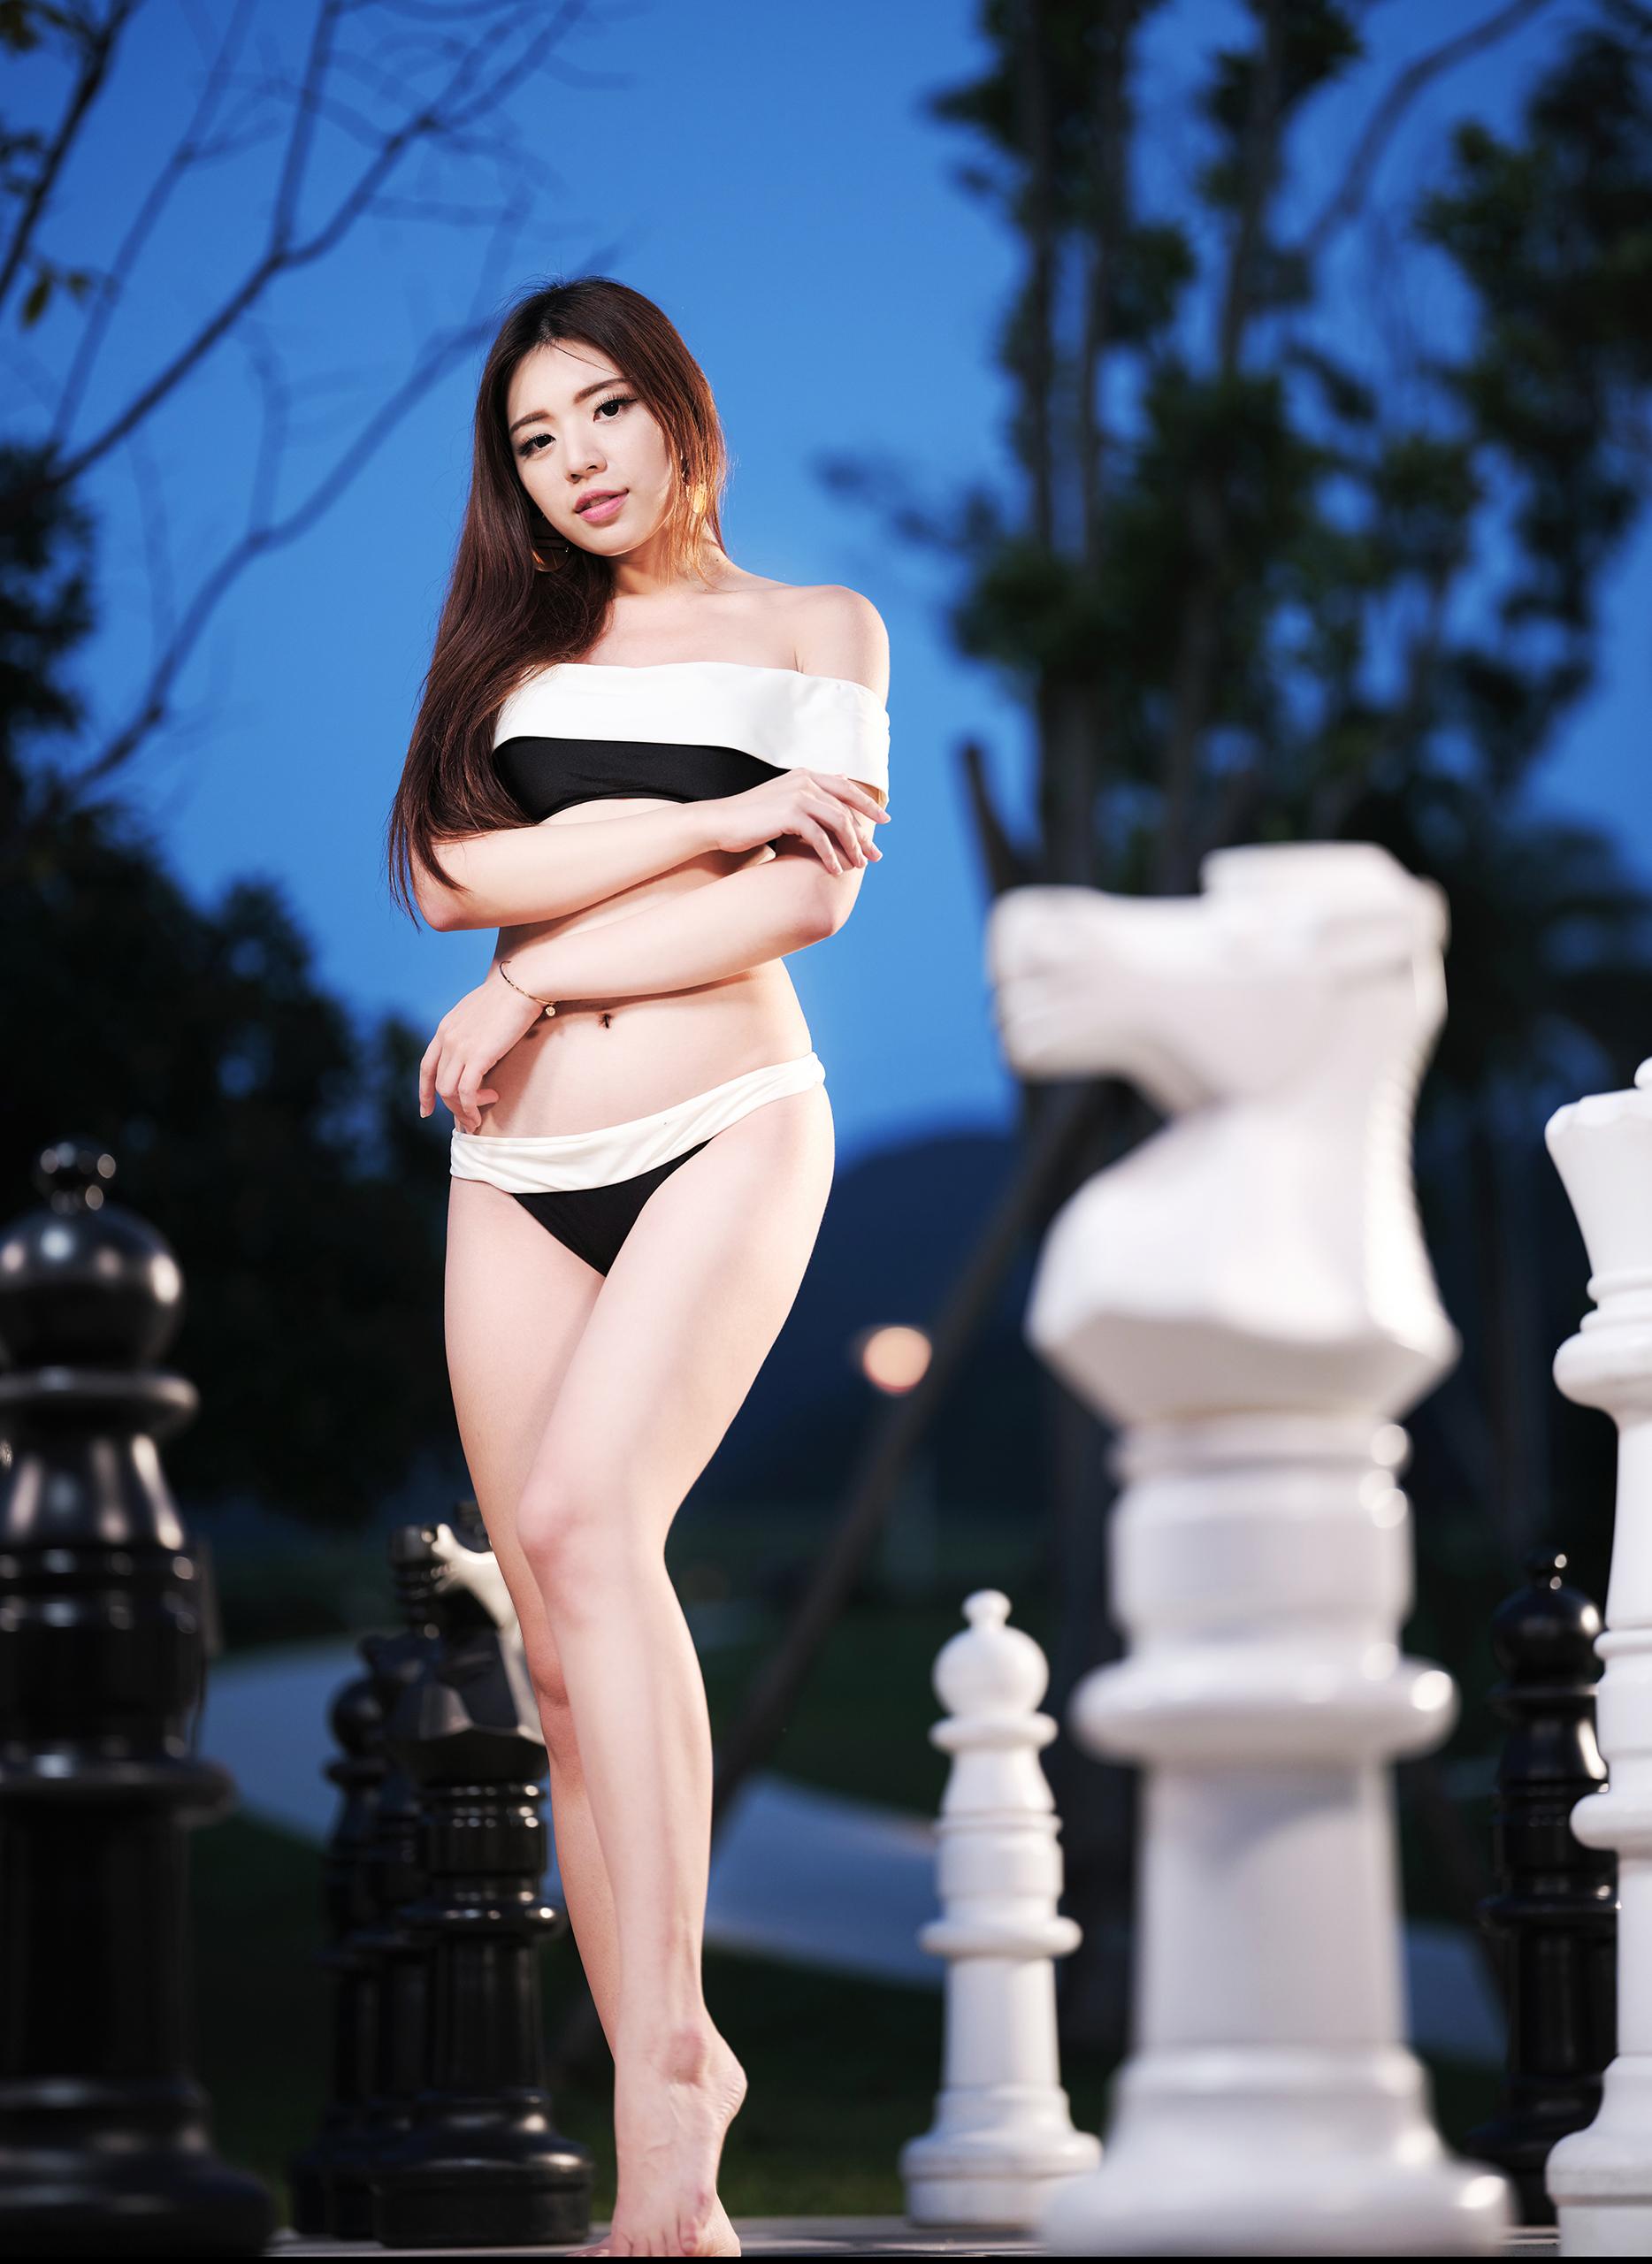 People 1868x2560 Kiki Hsieh model women Asian brunette long hair bikini bandeau top legs barefoot chess arms crossed portrait display women outdoors